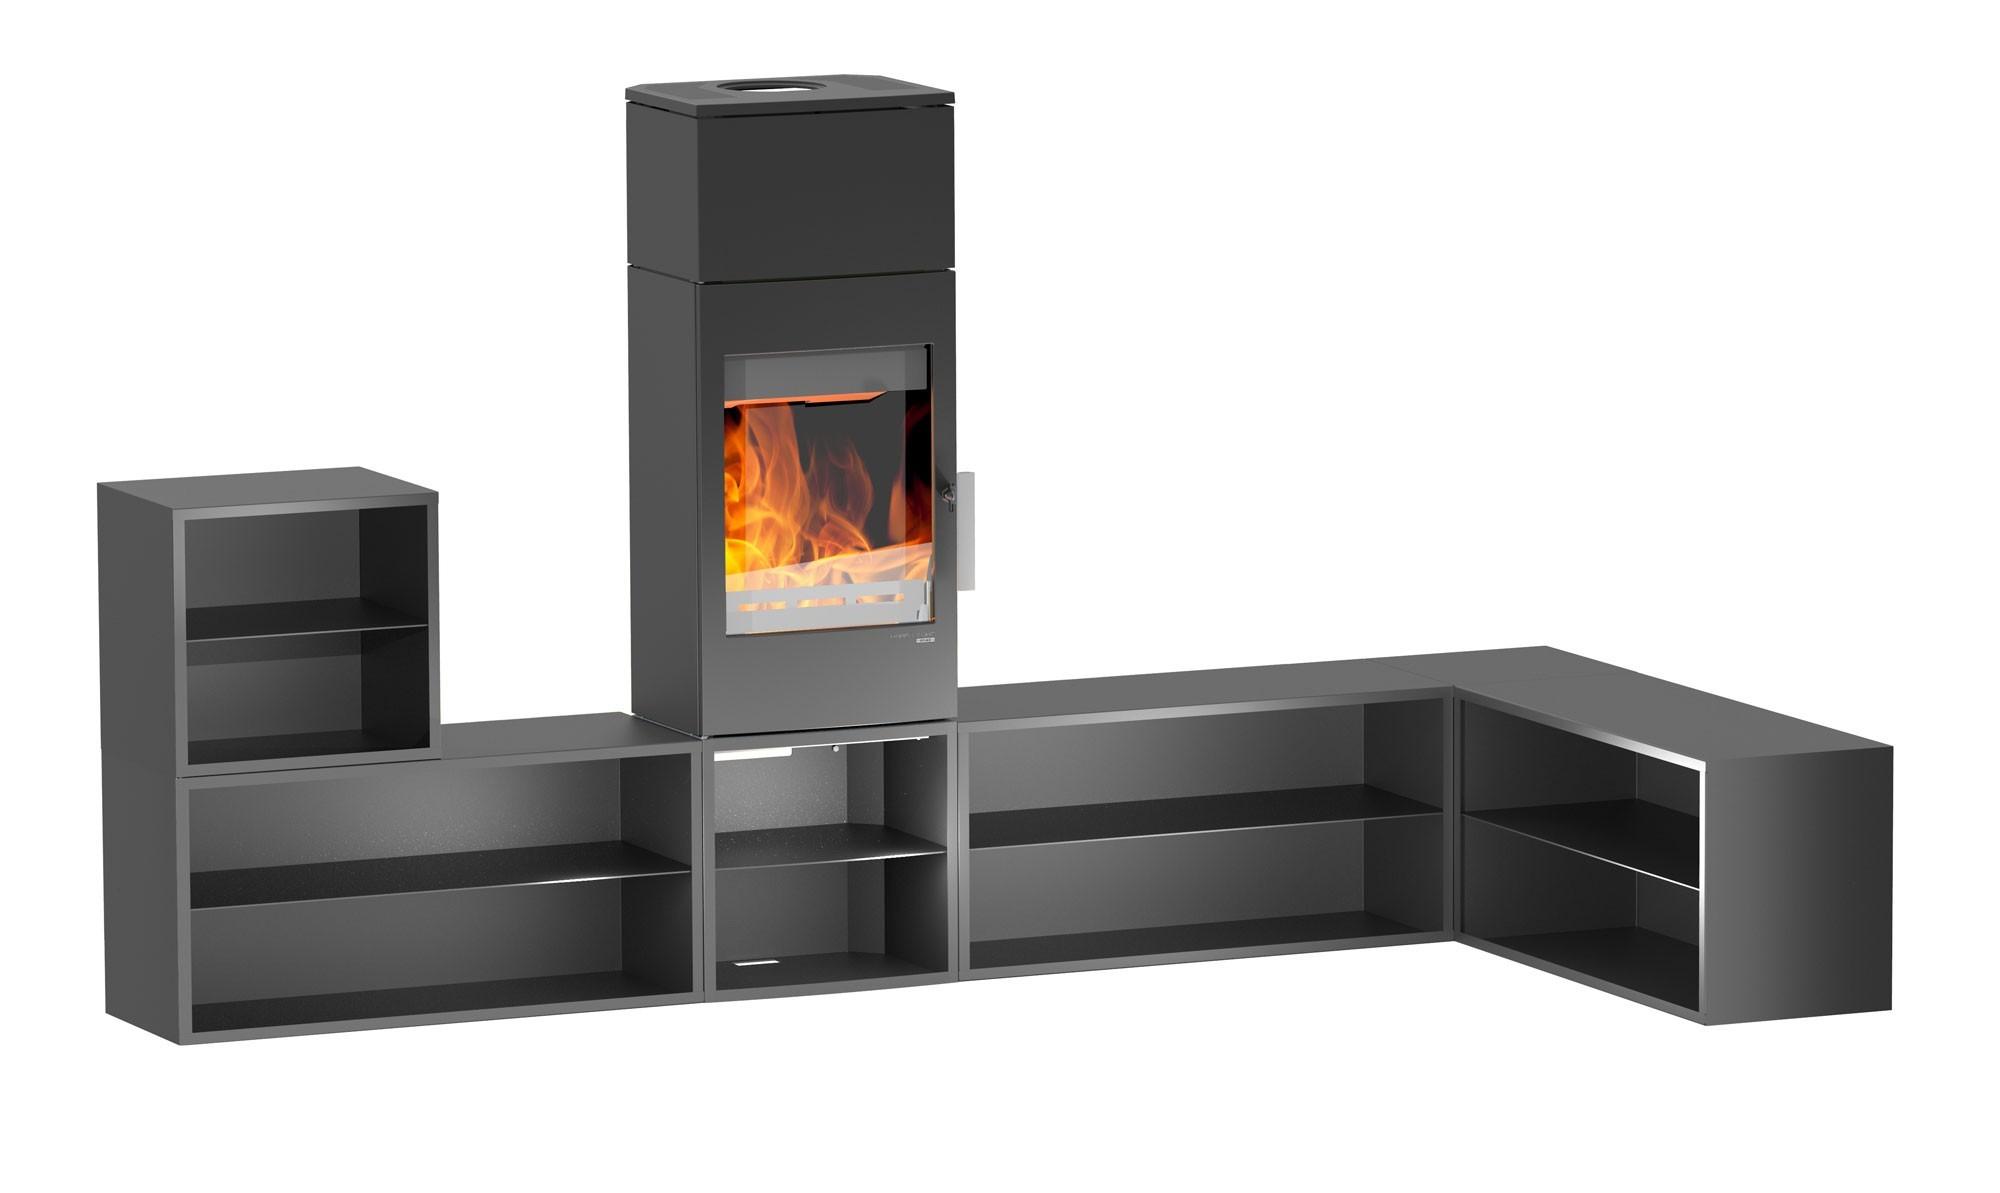 haas sohn sitzbank eckmodul gastein wien easy perl schwarz bei. Black Bedroom Furniture Sets. Home Design Ideas